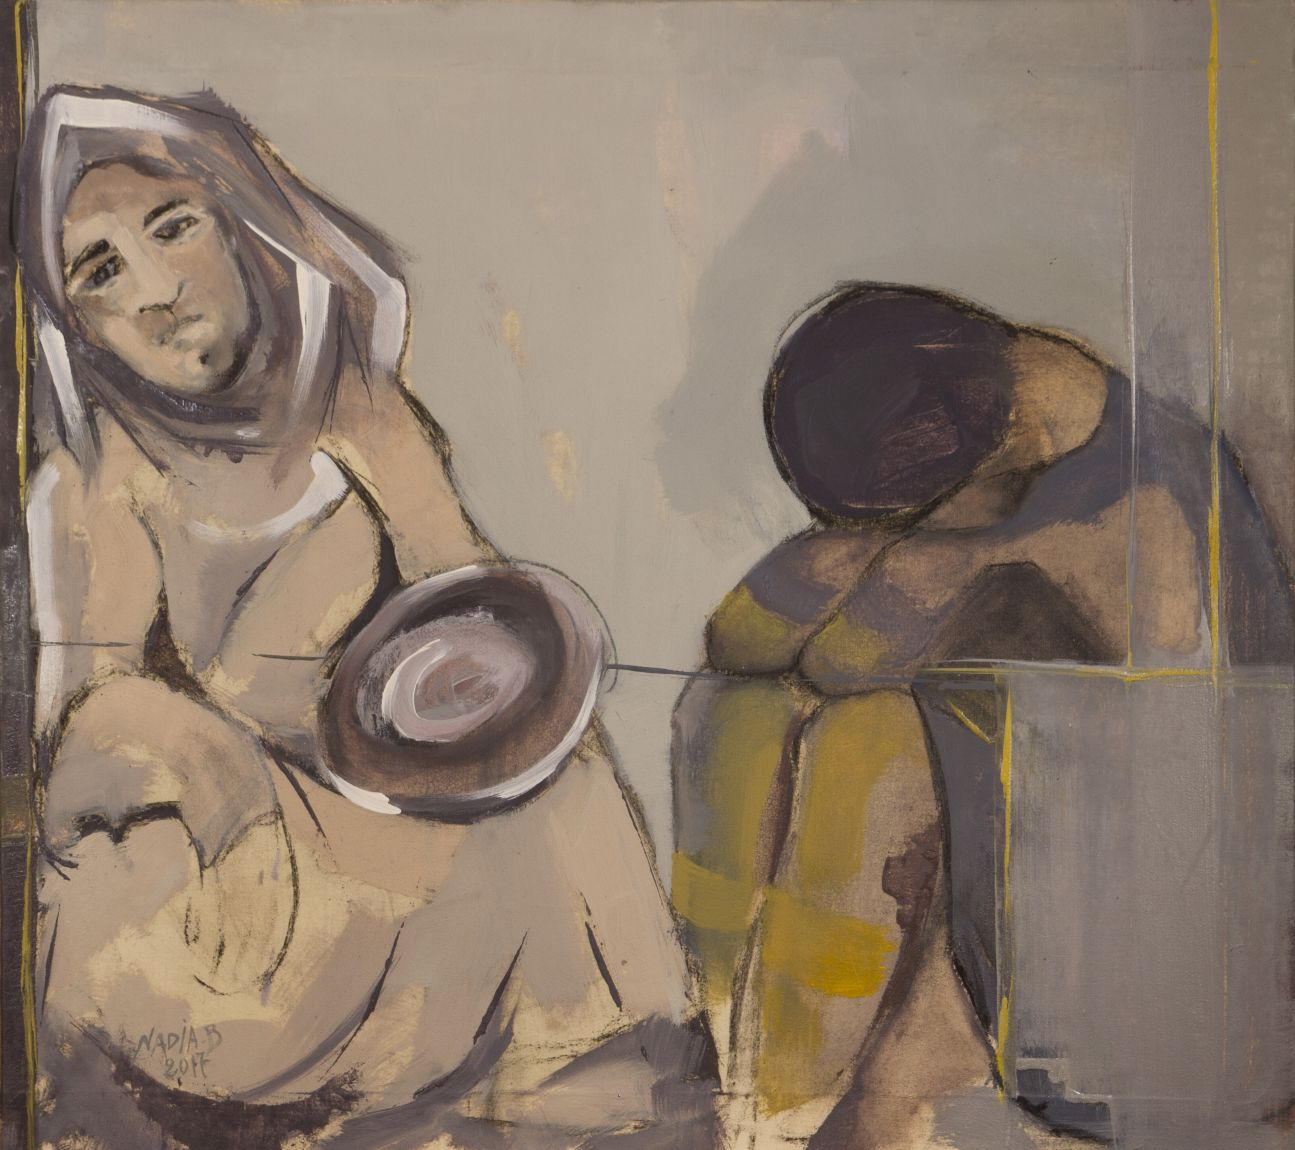 la nececidad (2017) - Nadia Boulaich - NB